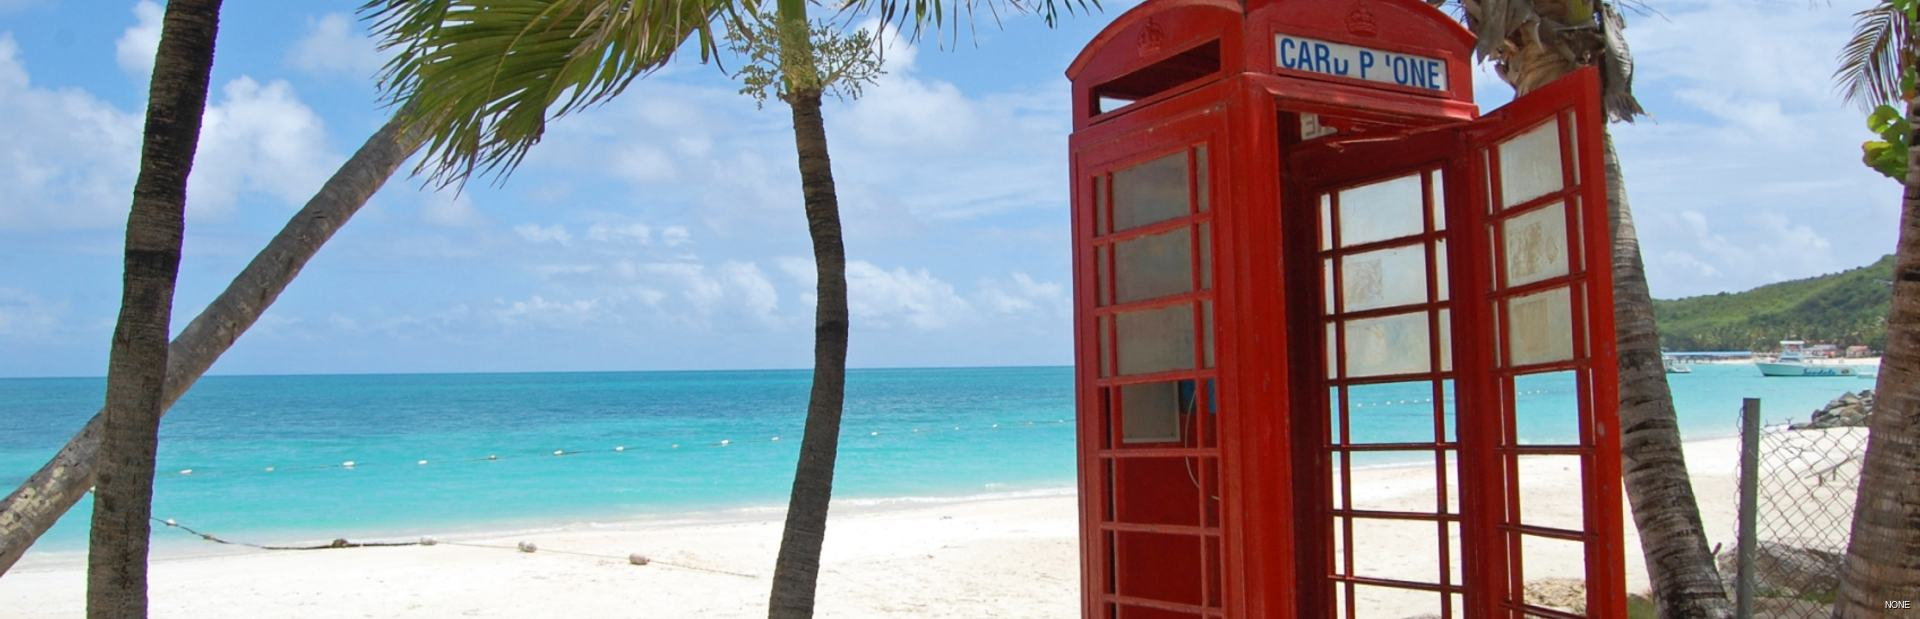 Red phone box on Gibbes Beach, Barbados